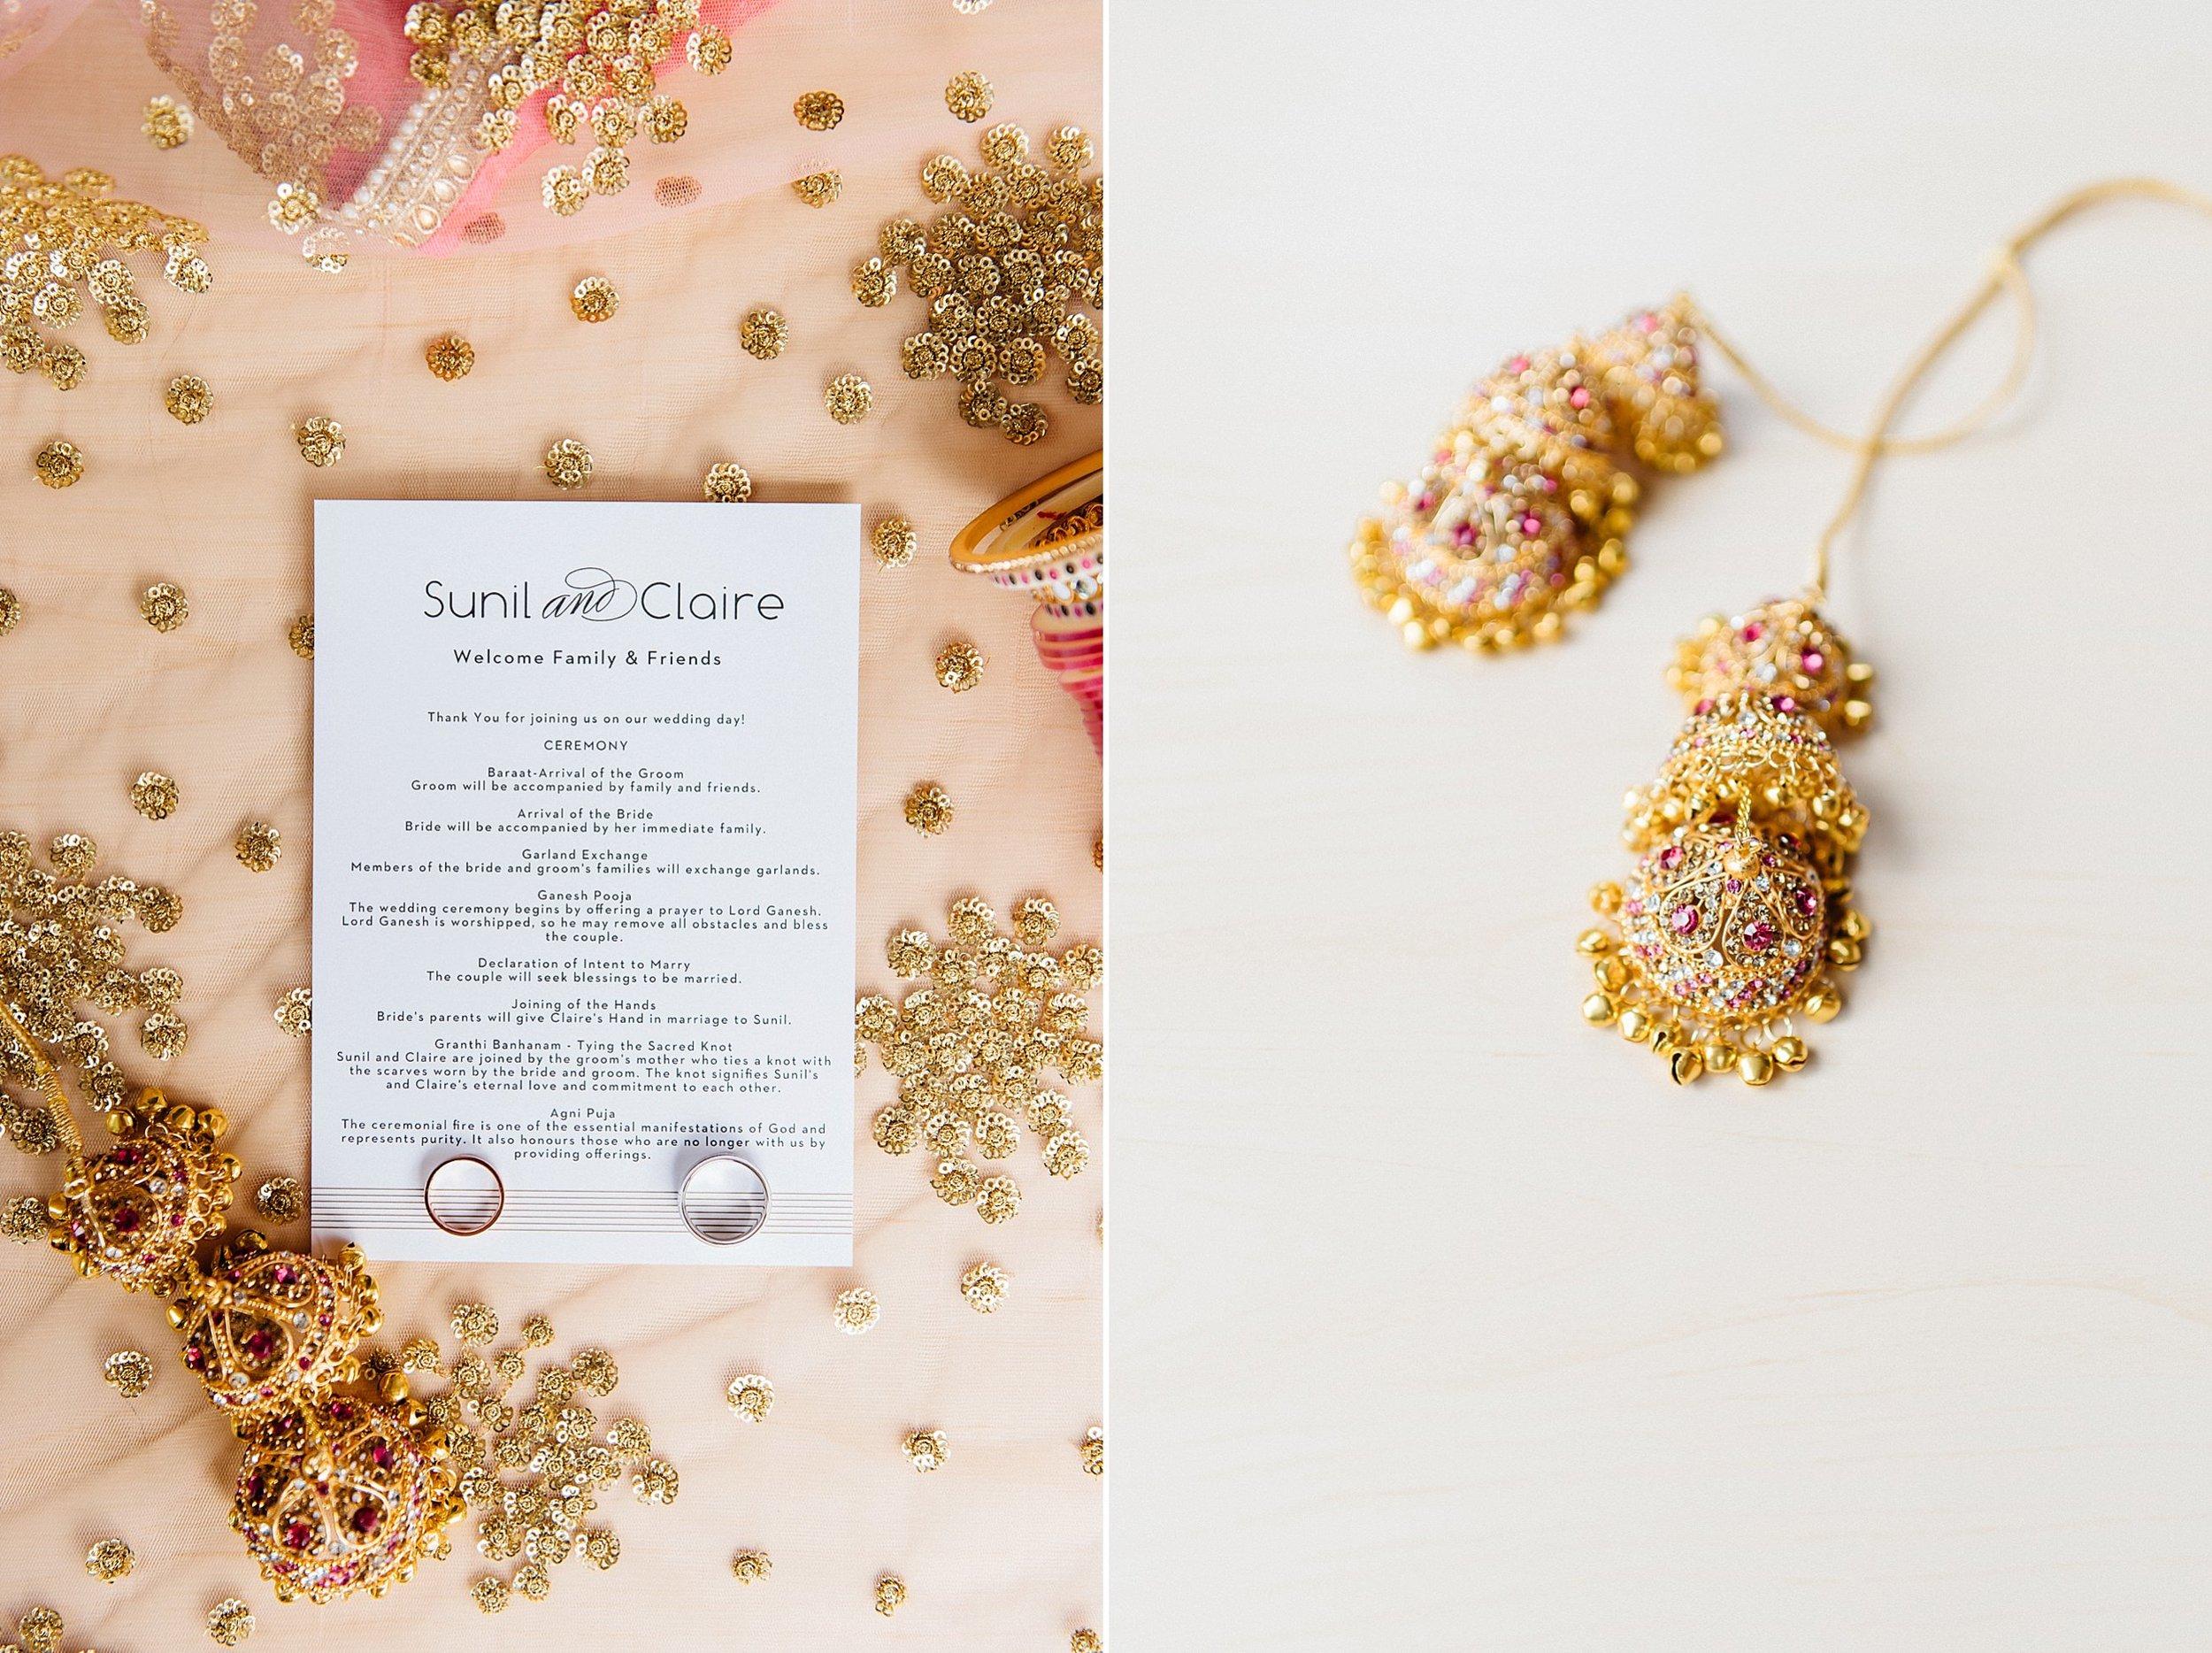 Claire + Sunny Wedding Highlights | Ali & Batoul Photography-5.jpg